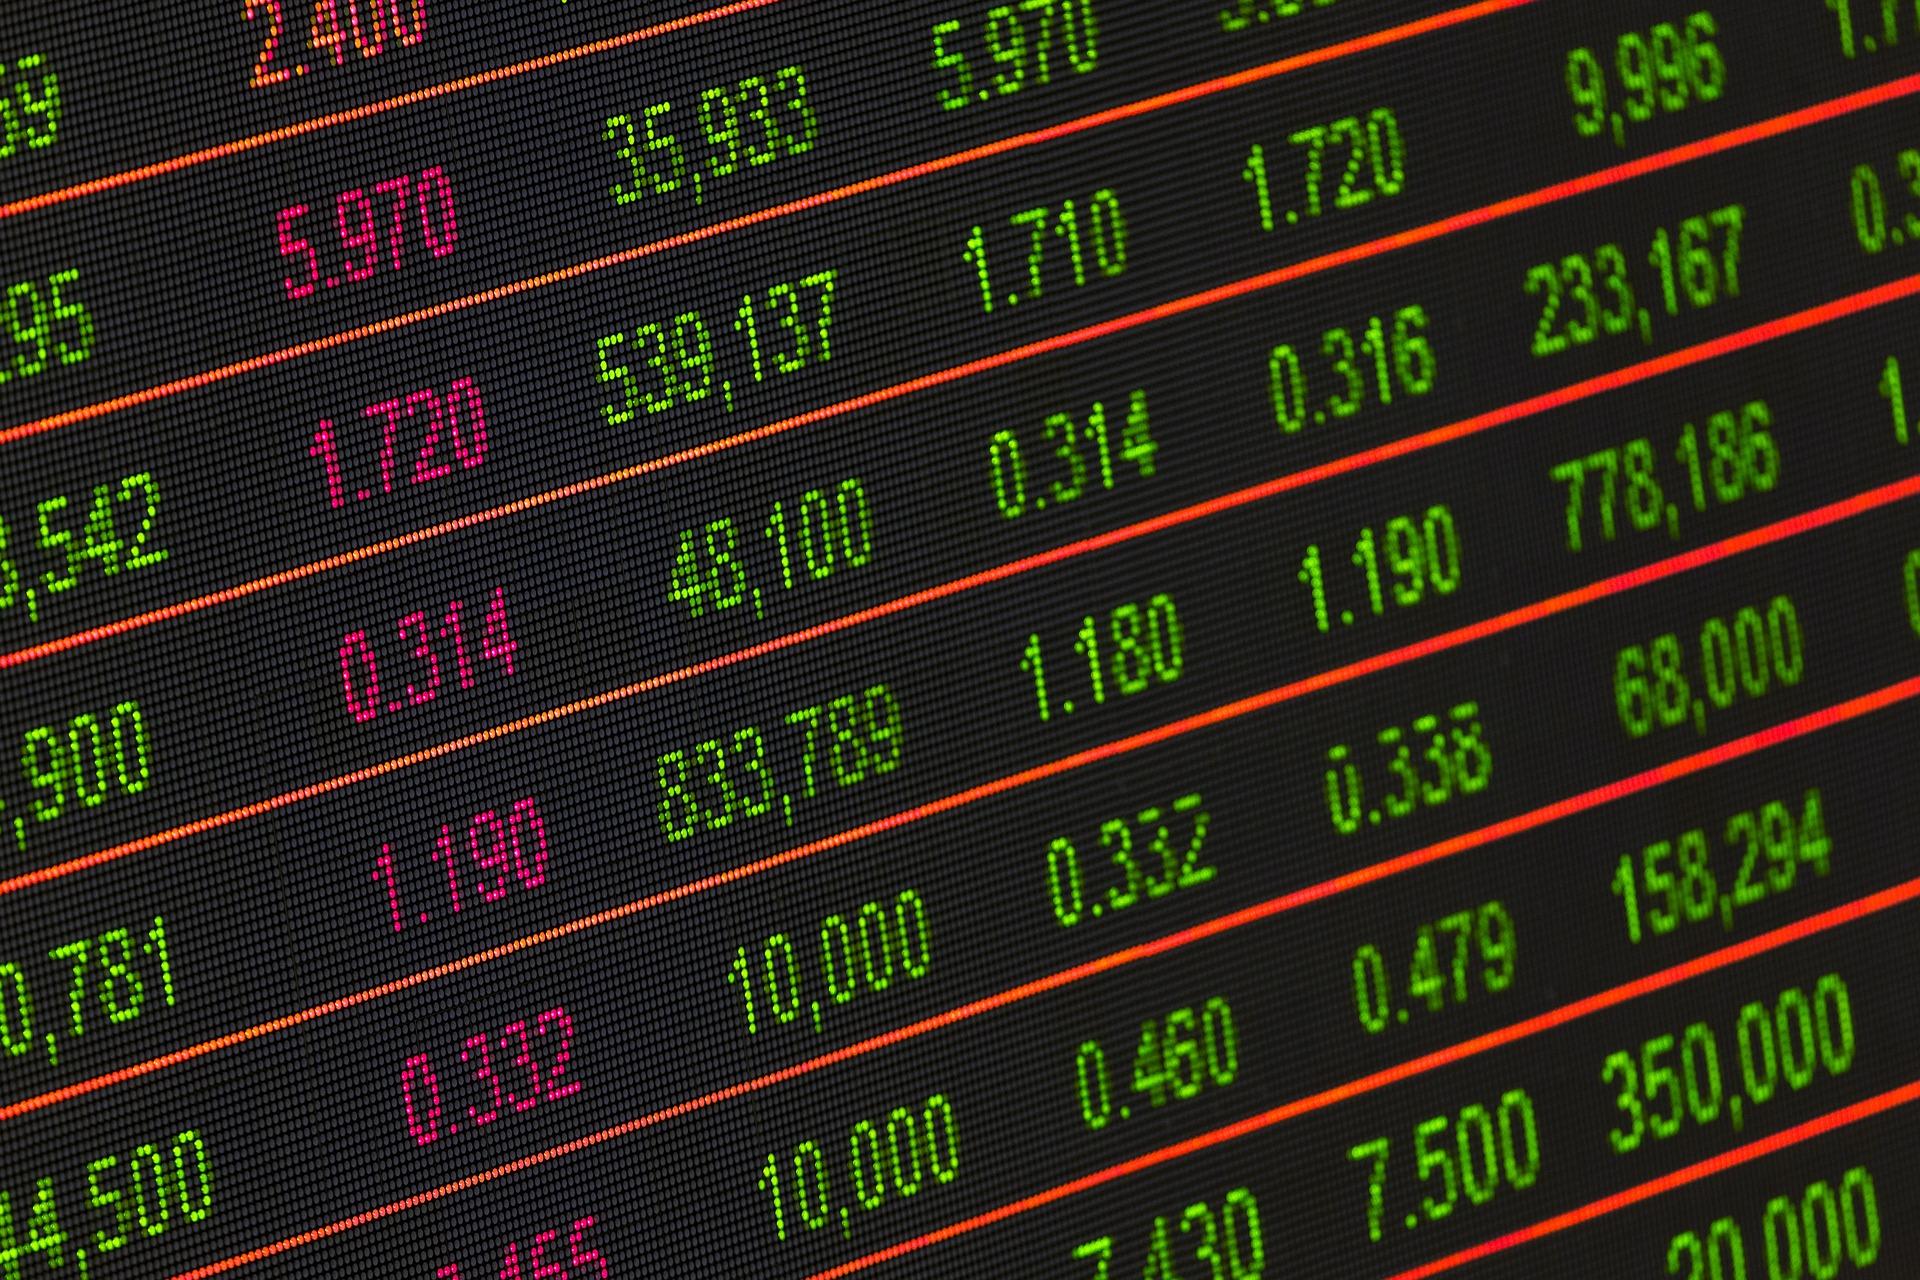 Bolsa Mexicana termina con ligero avance ante cierre de Wall Street